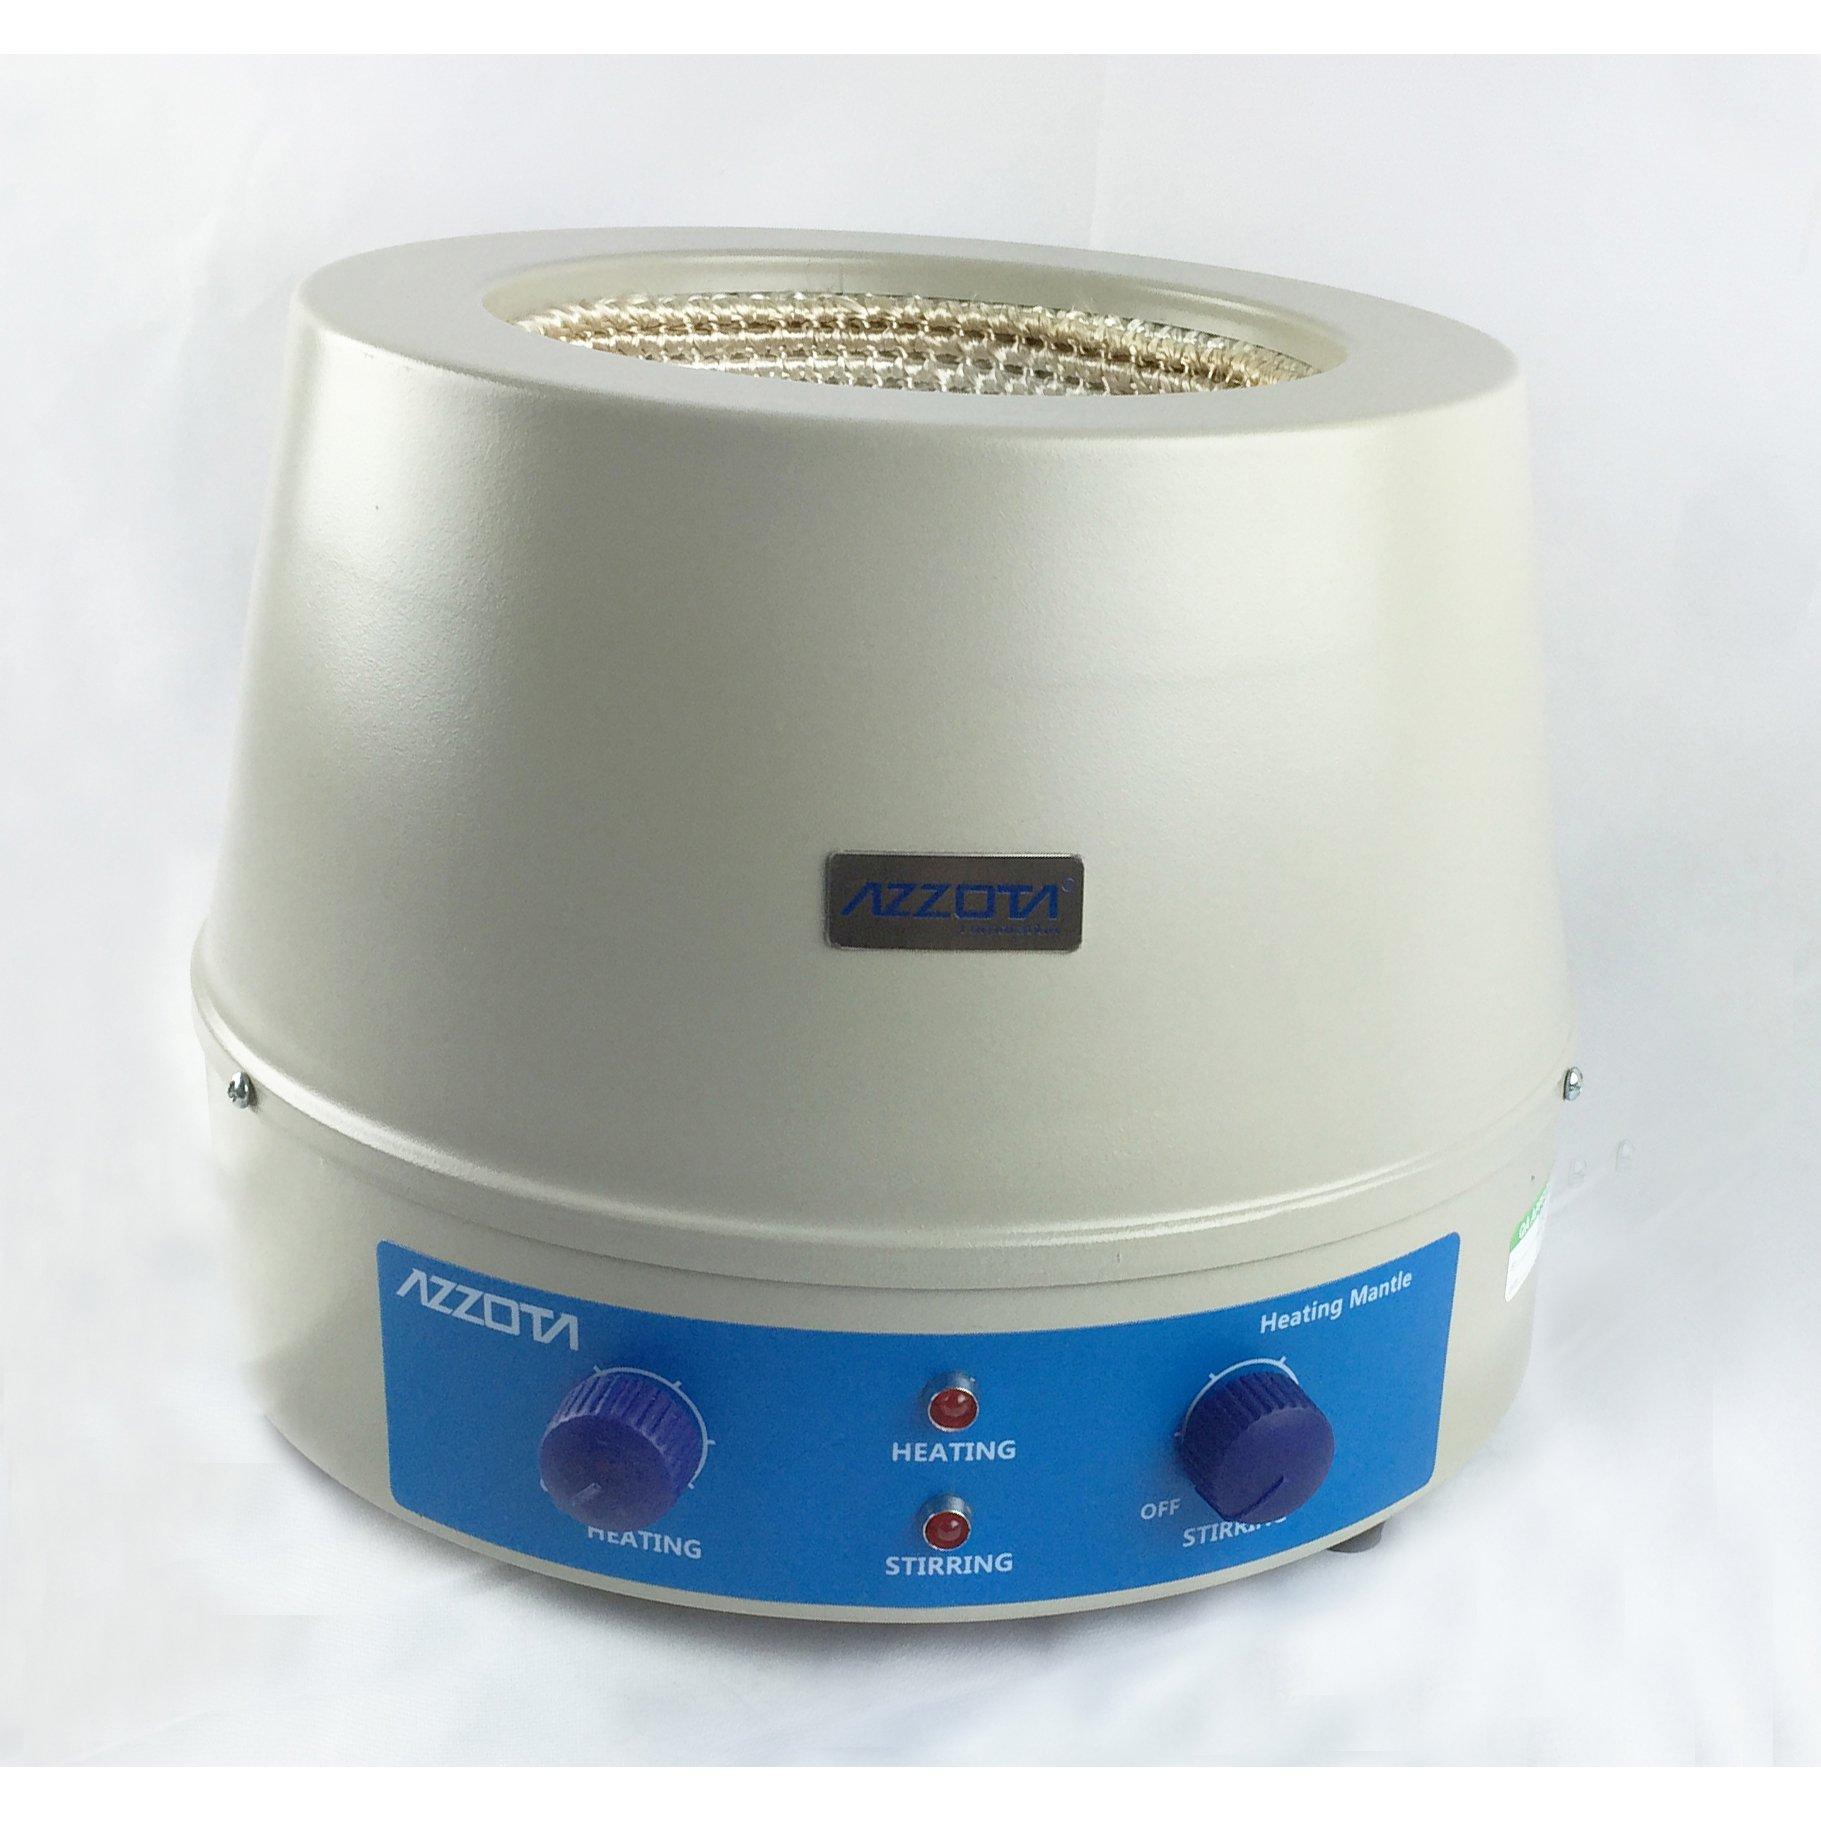 Azzota SHM-1000, Stirring Heating Mantle - 1000ml, 350W, Stir speed: 0 to 1400rpm, Maximum temperature 420C (790F) by Azzota